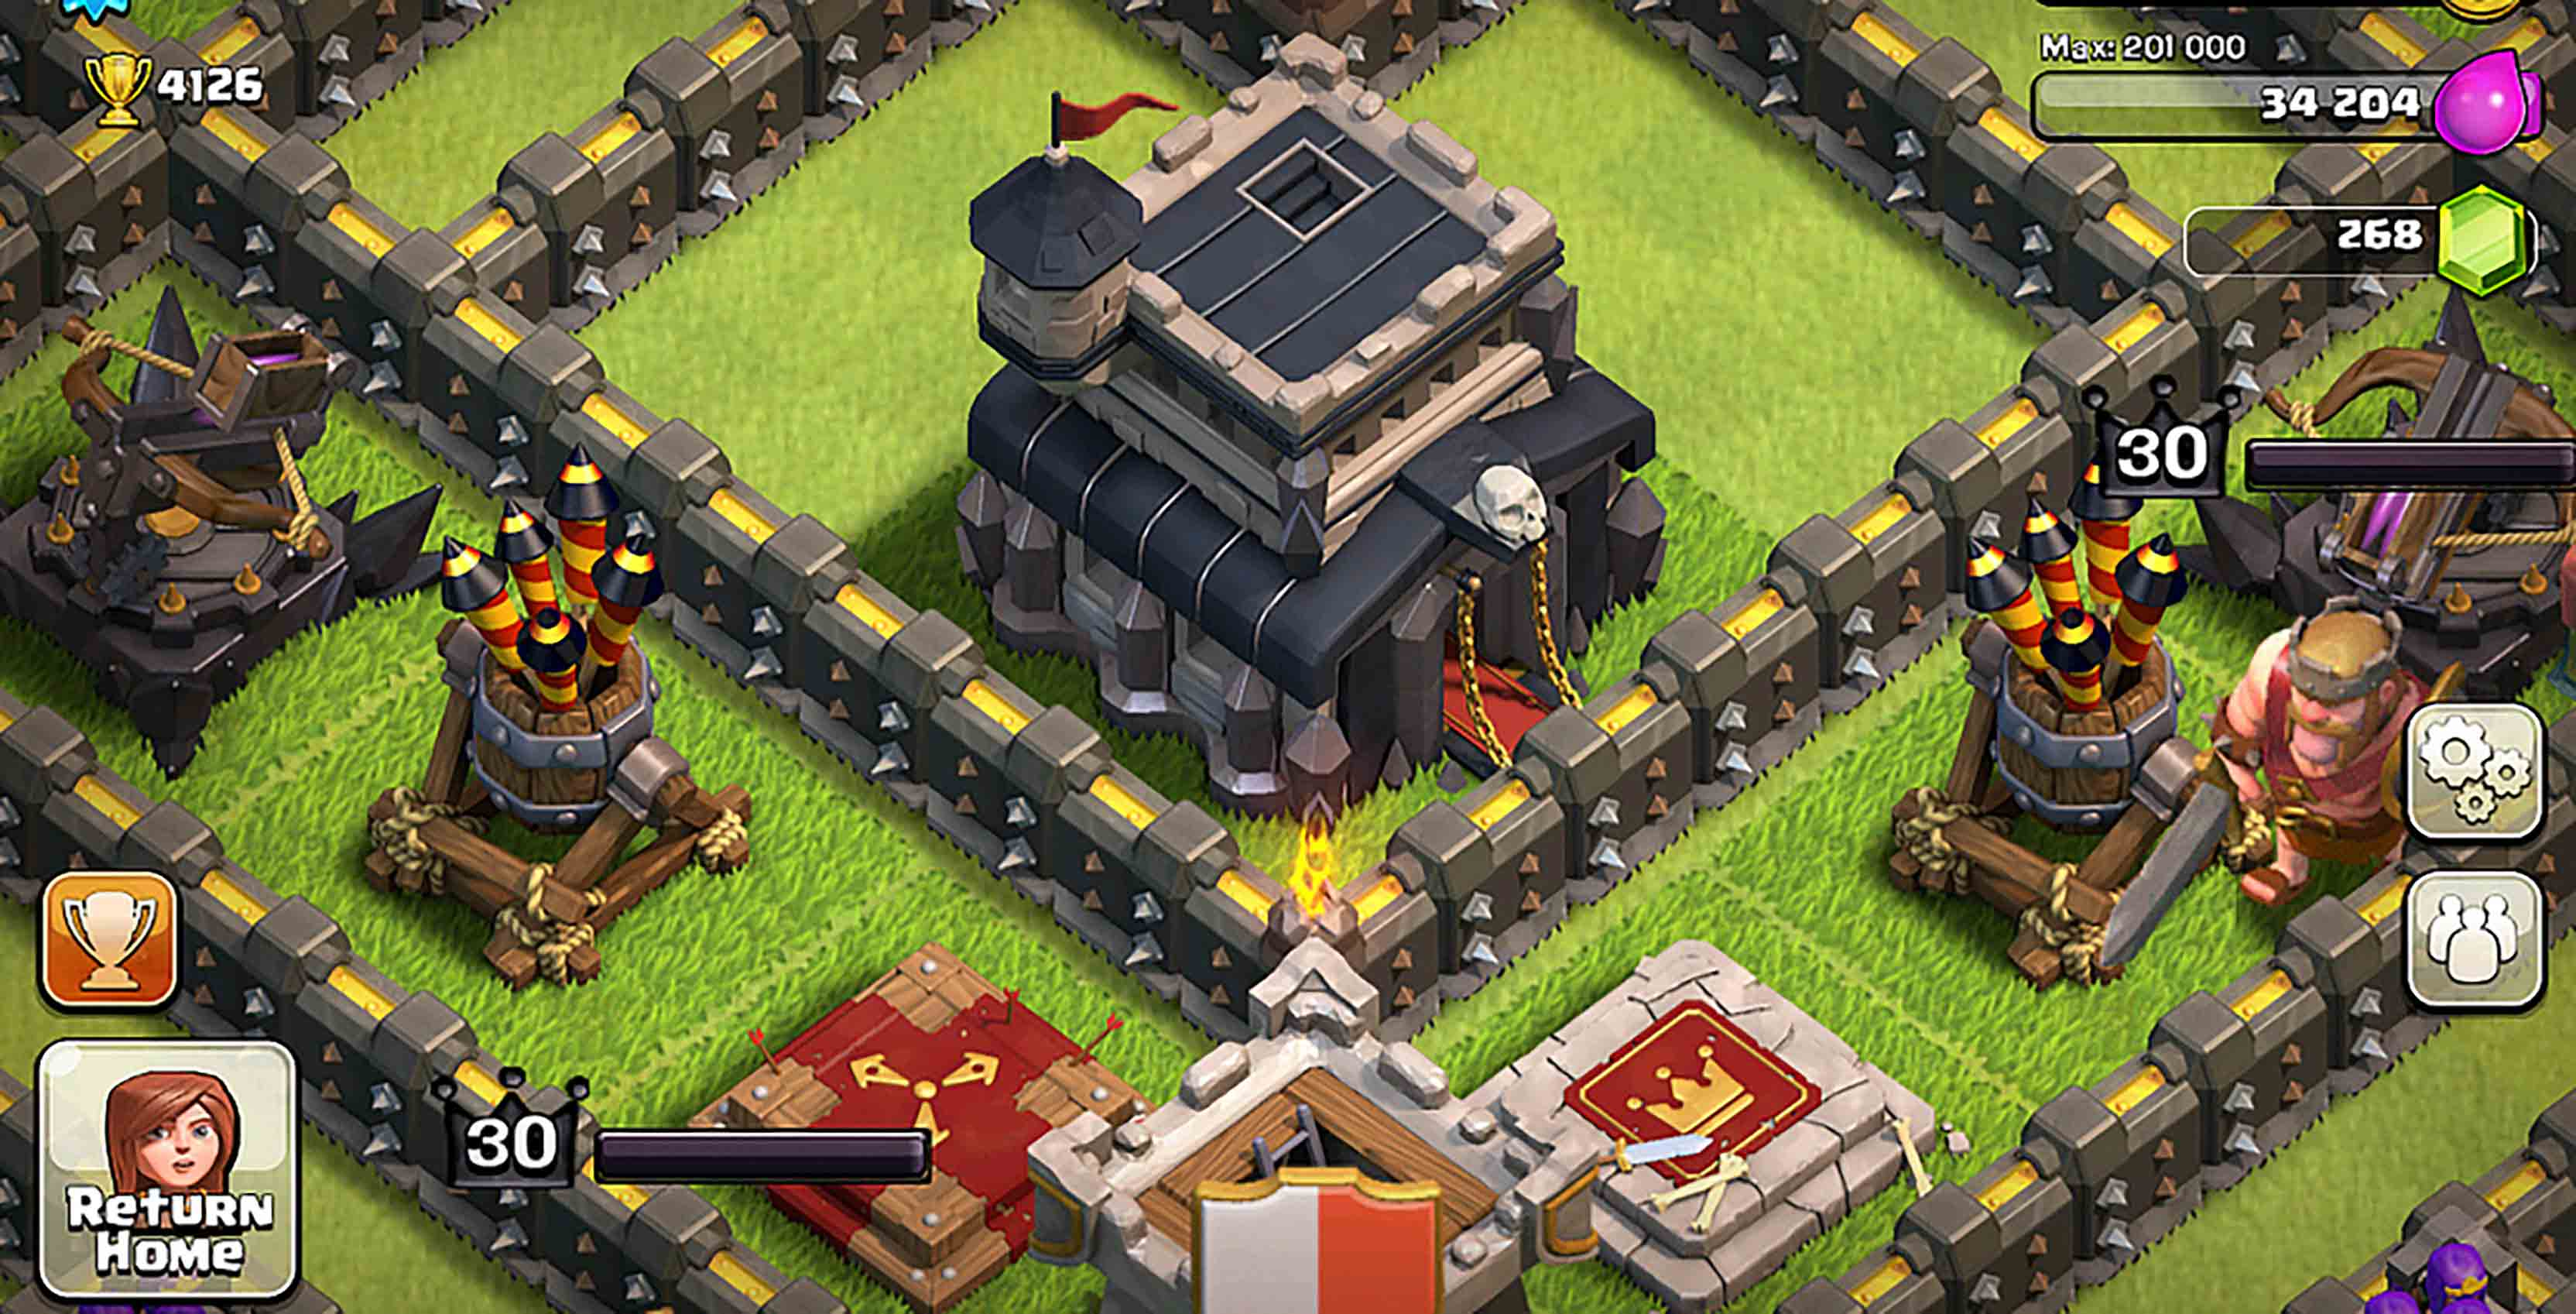 Clash of Clans game screenshot